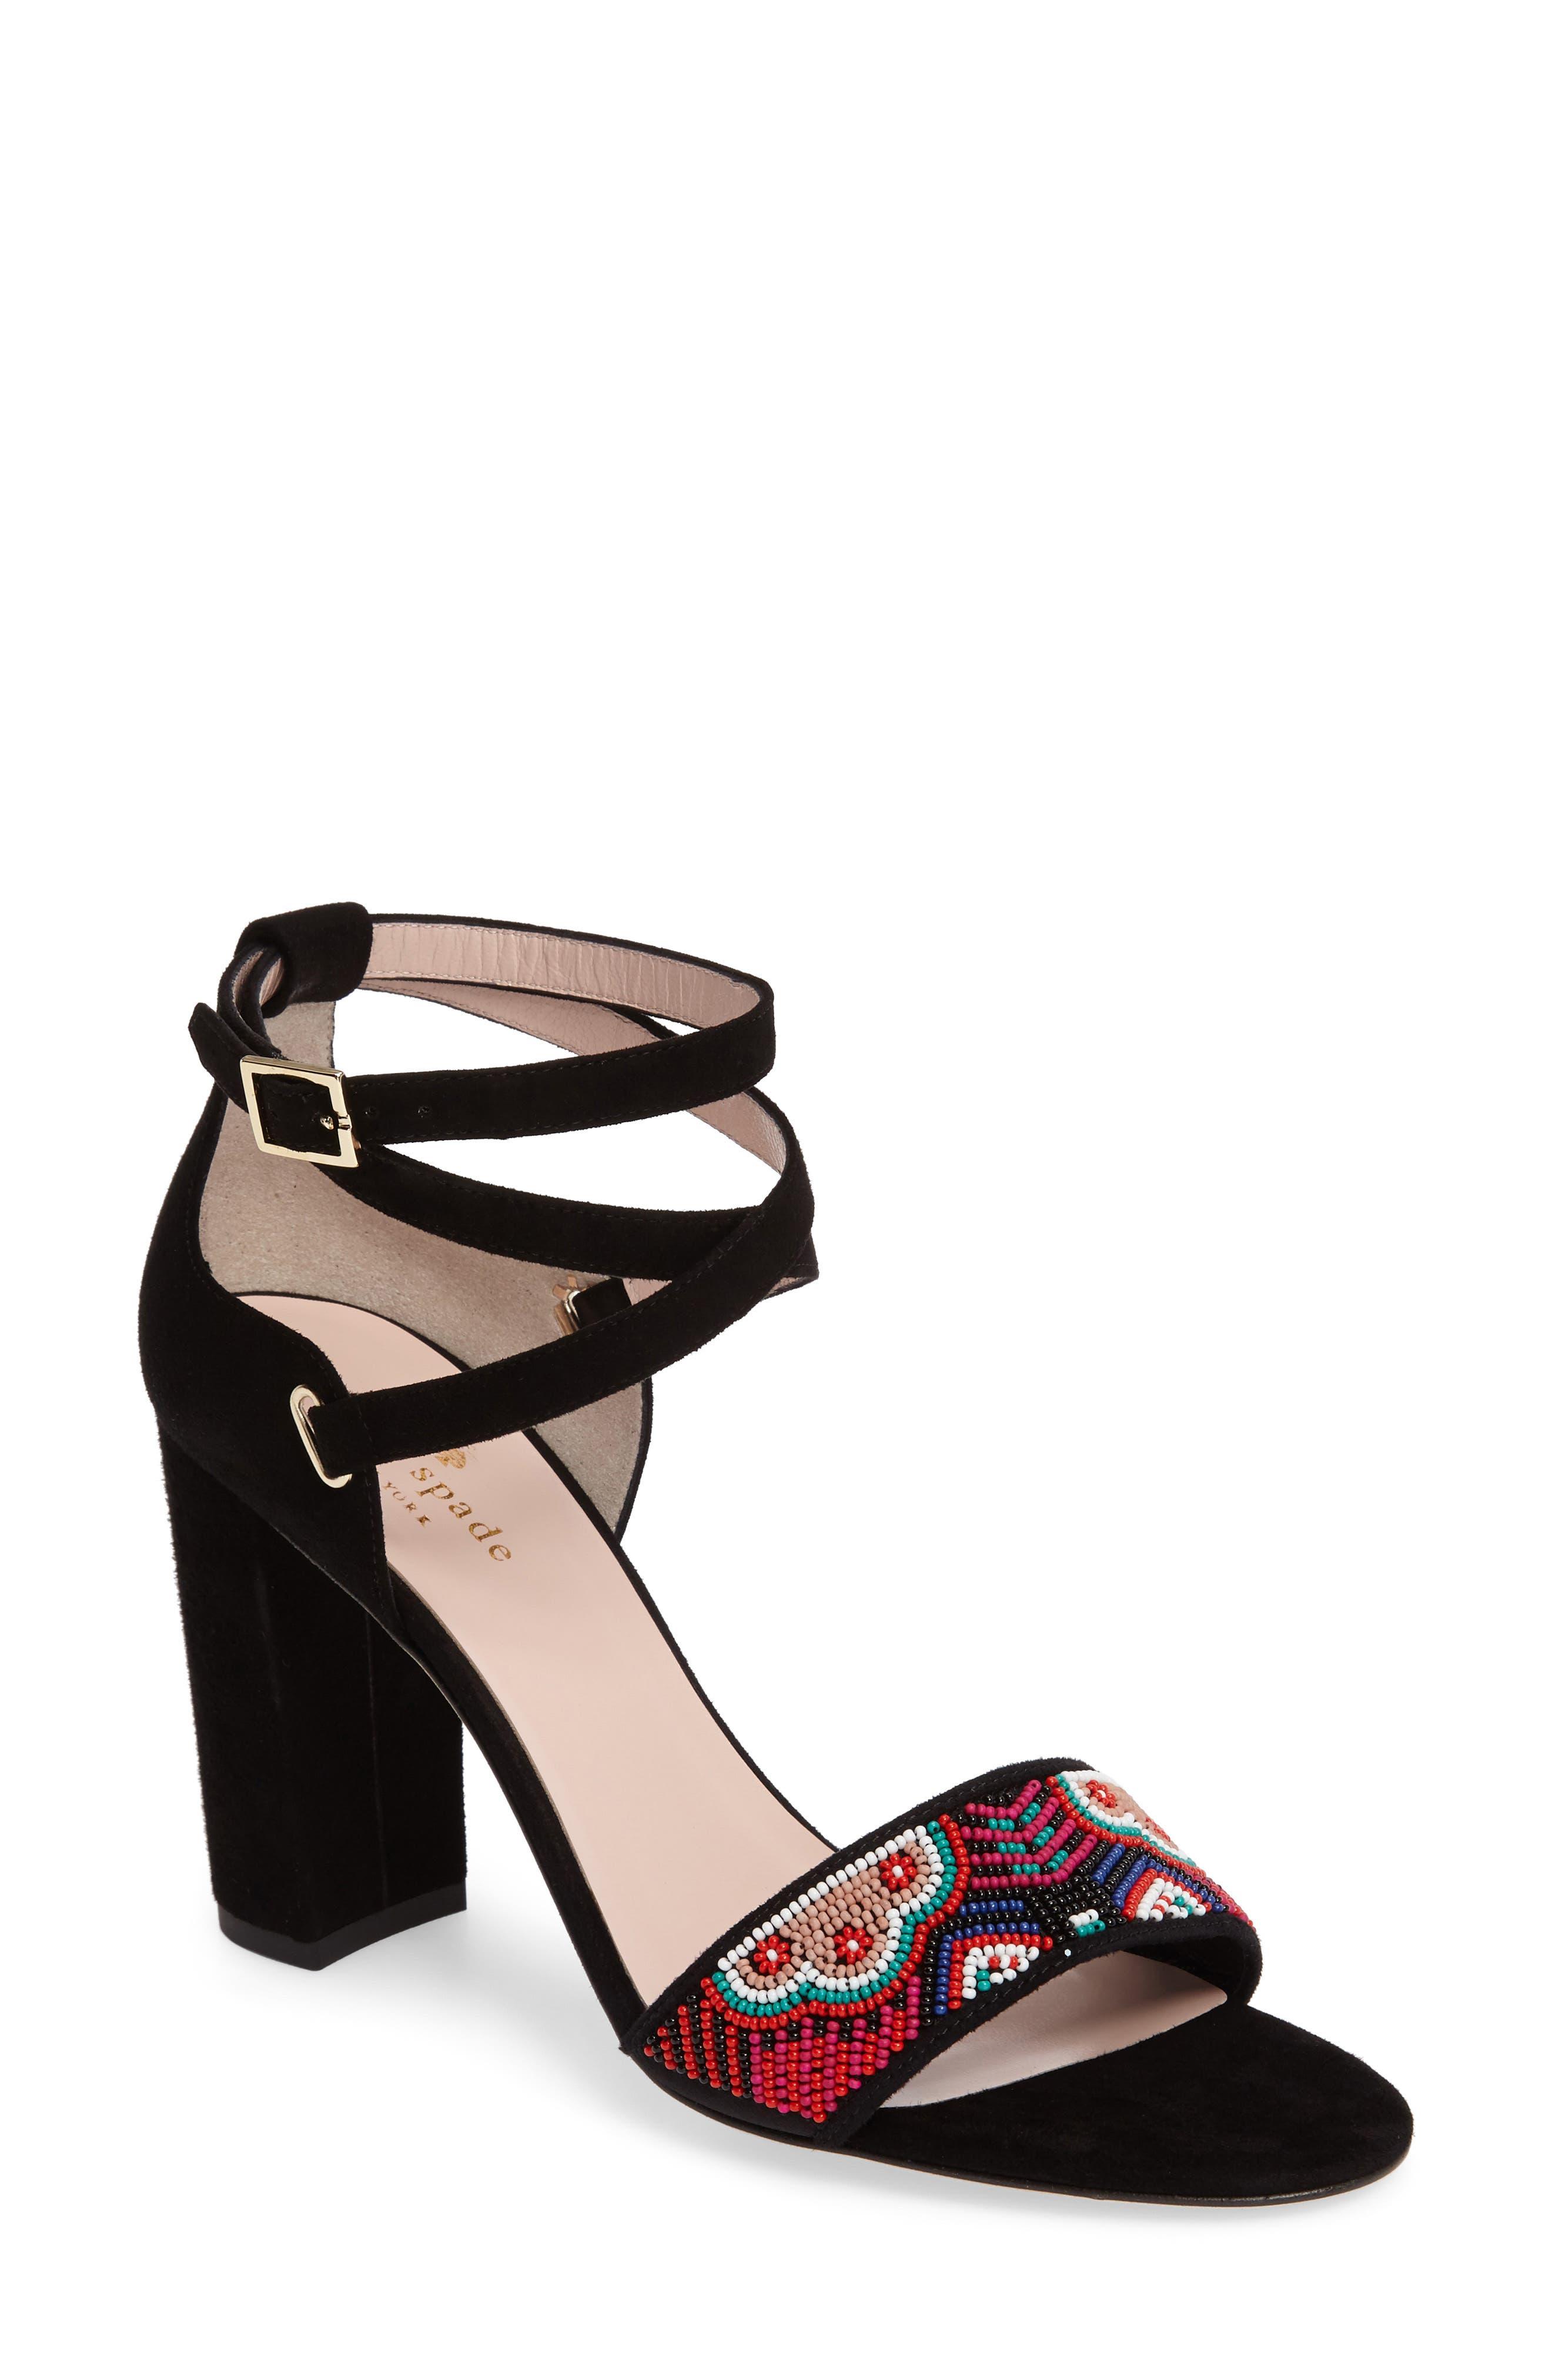 KATE SPADE NEW YORK isle sandal